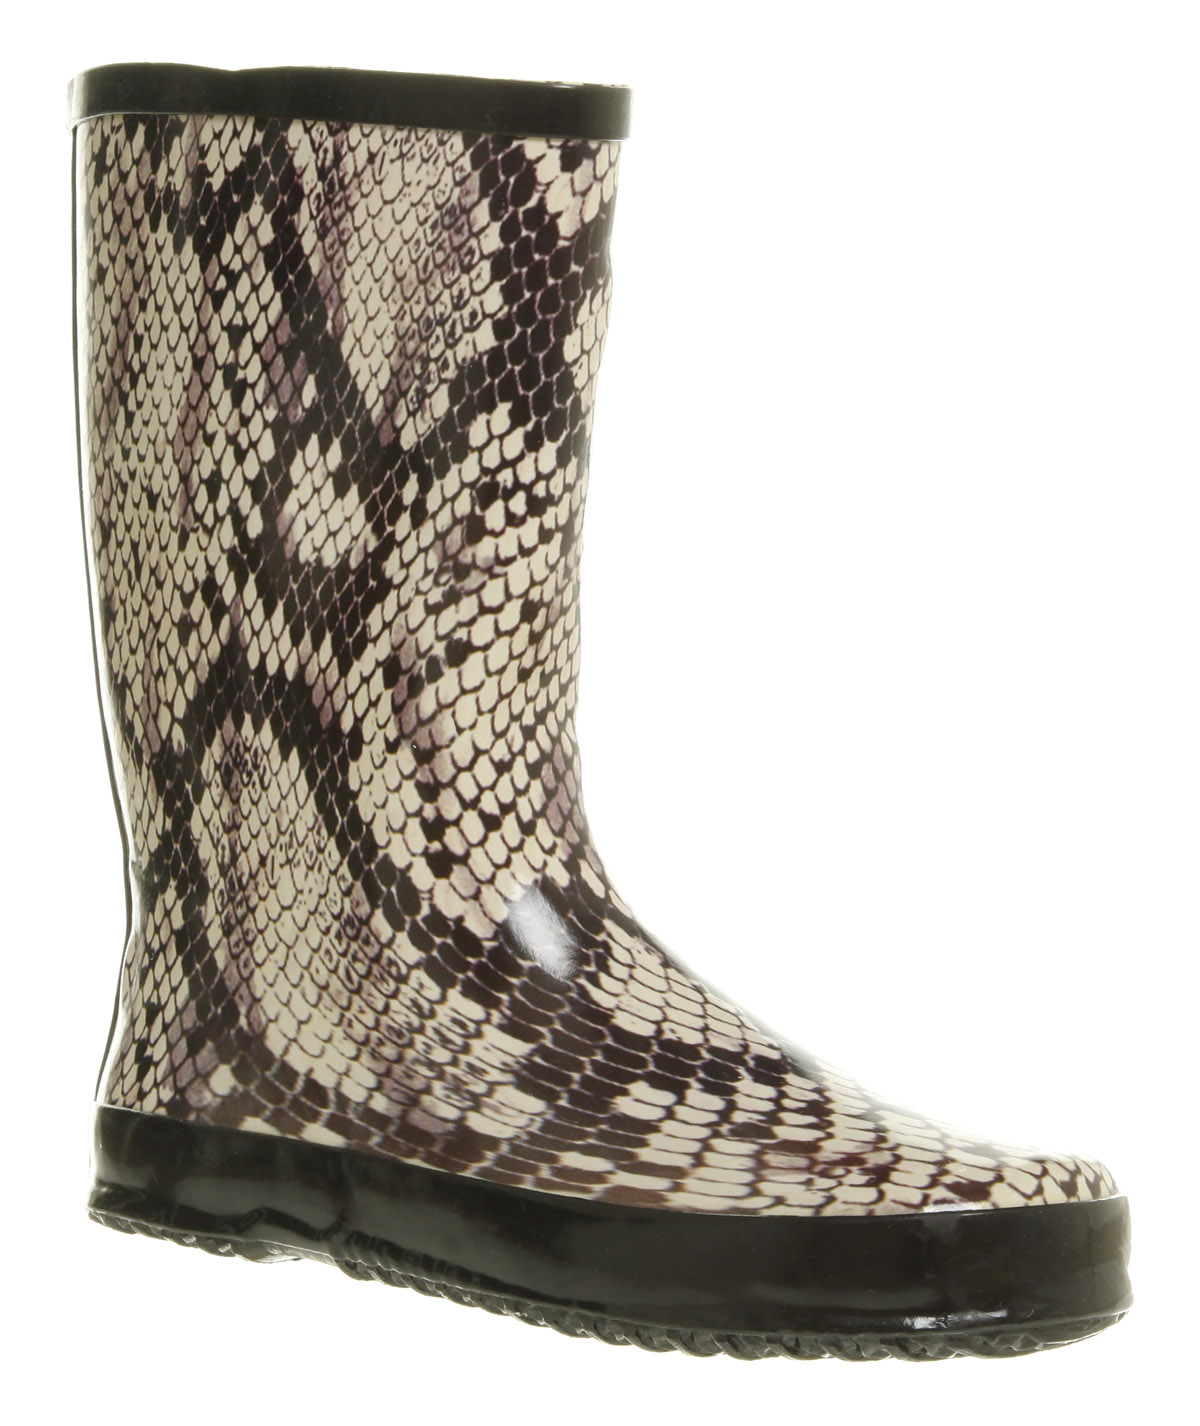 Innovative Chippewa Women39s Tan Apache Realtree Camo 15 Inch Snake Boot L25118